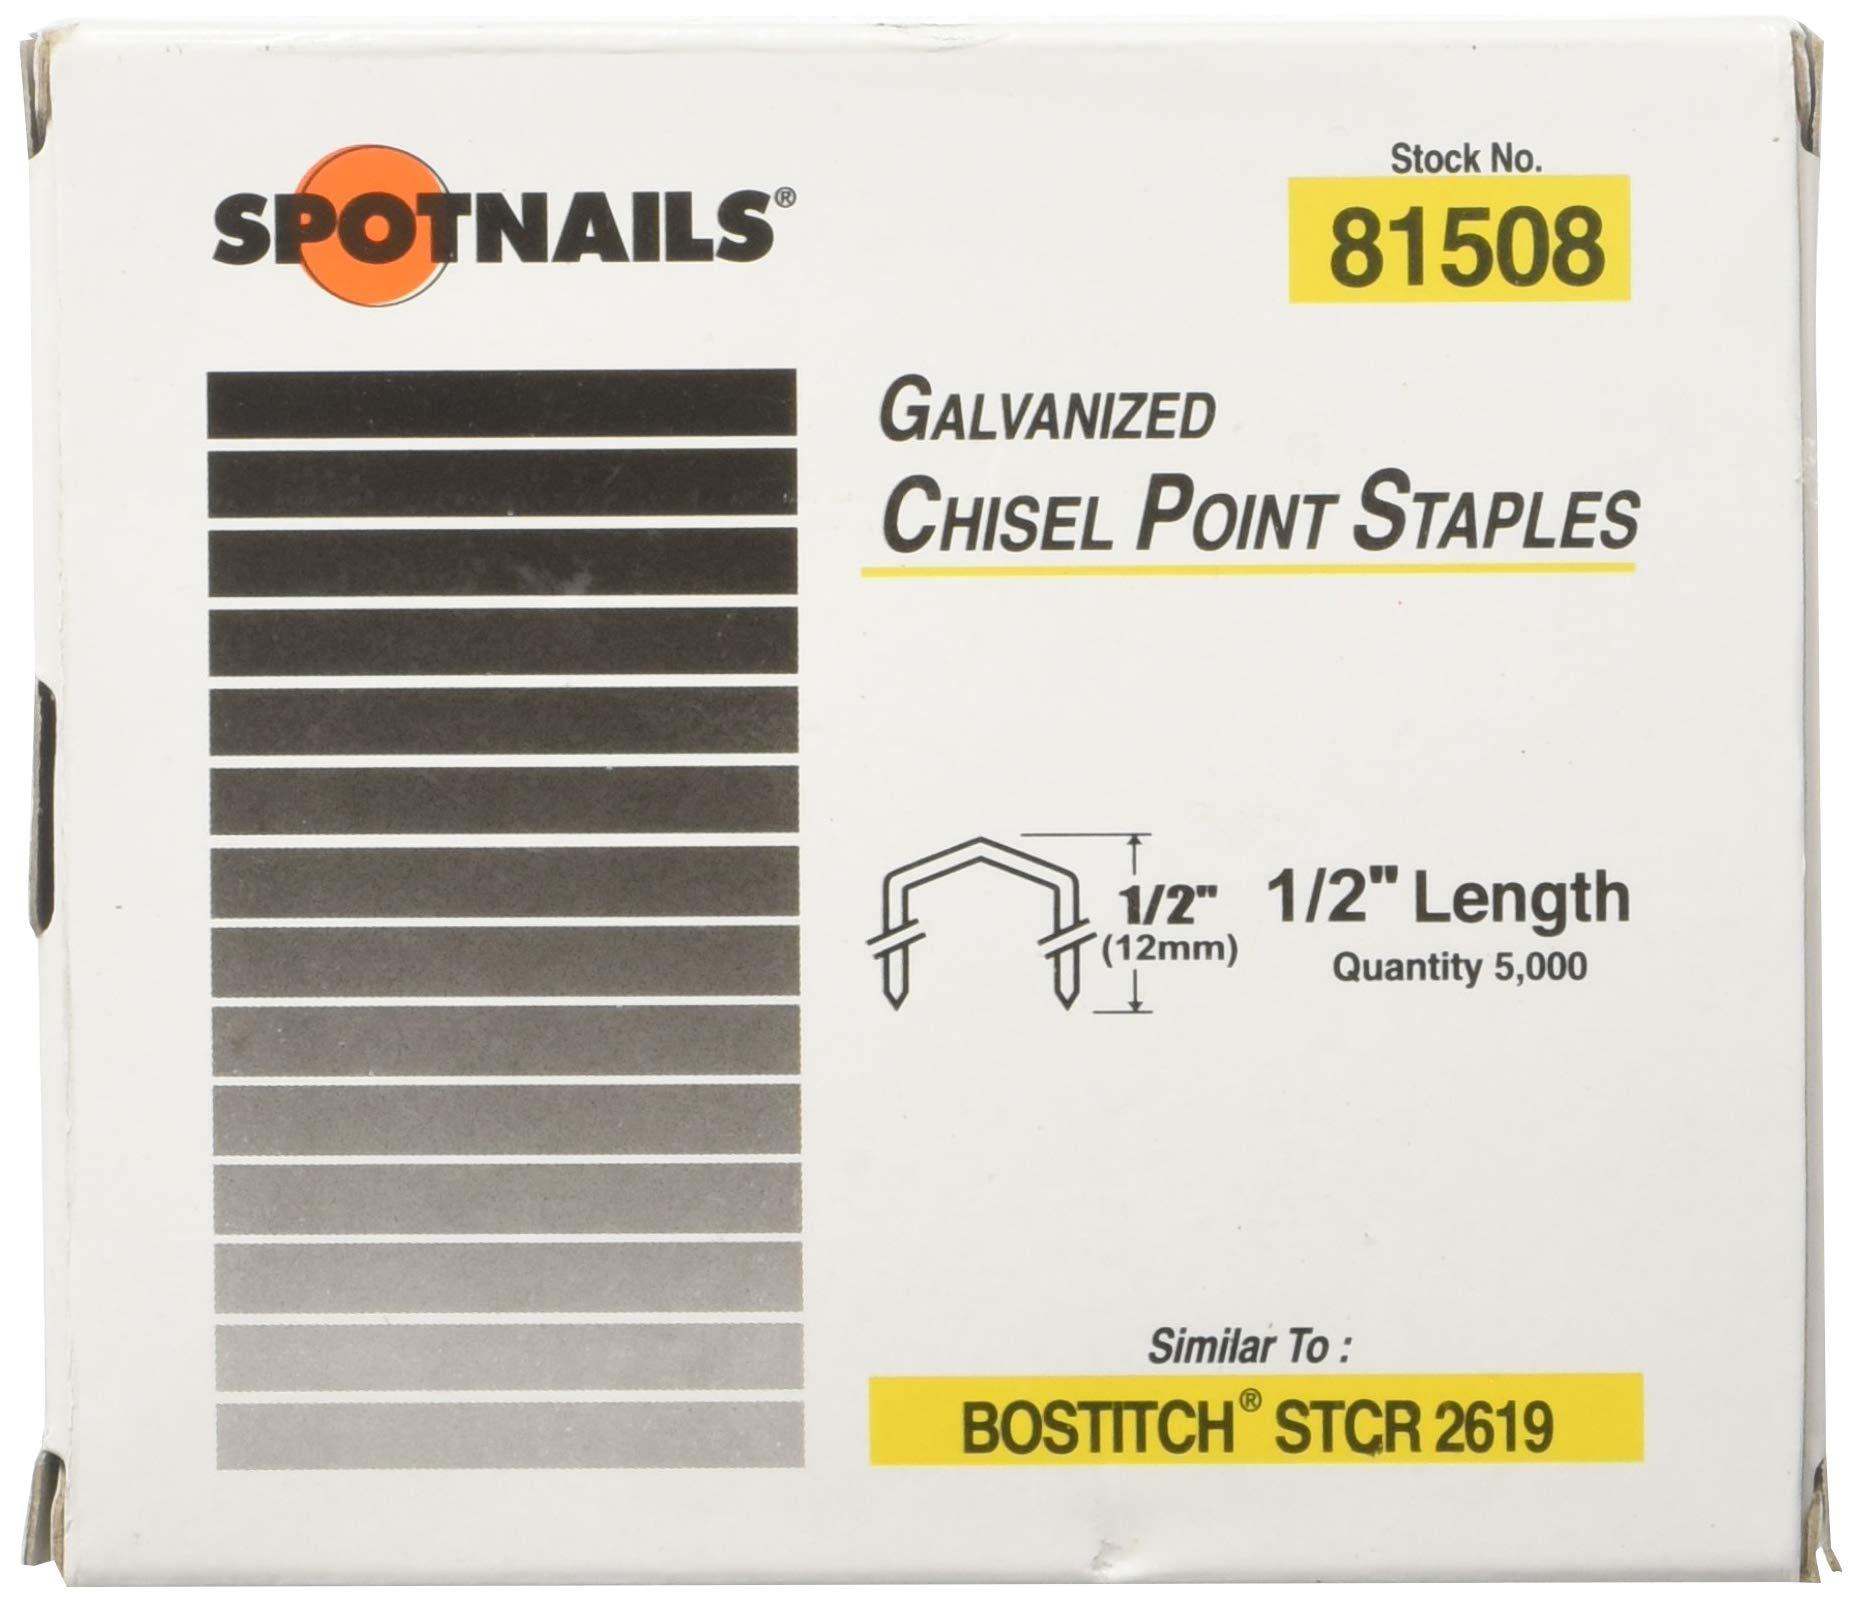 Spot Nails Spot Nails 81508 1/2-inch Staples similar to Bostitch STCR2619 5,000 per Box